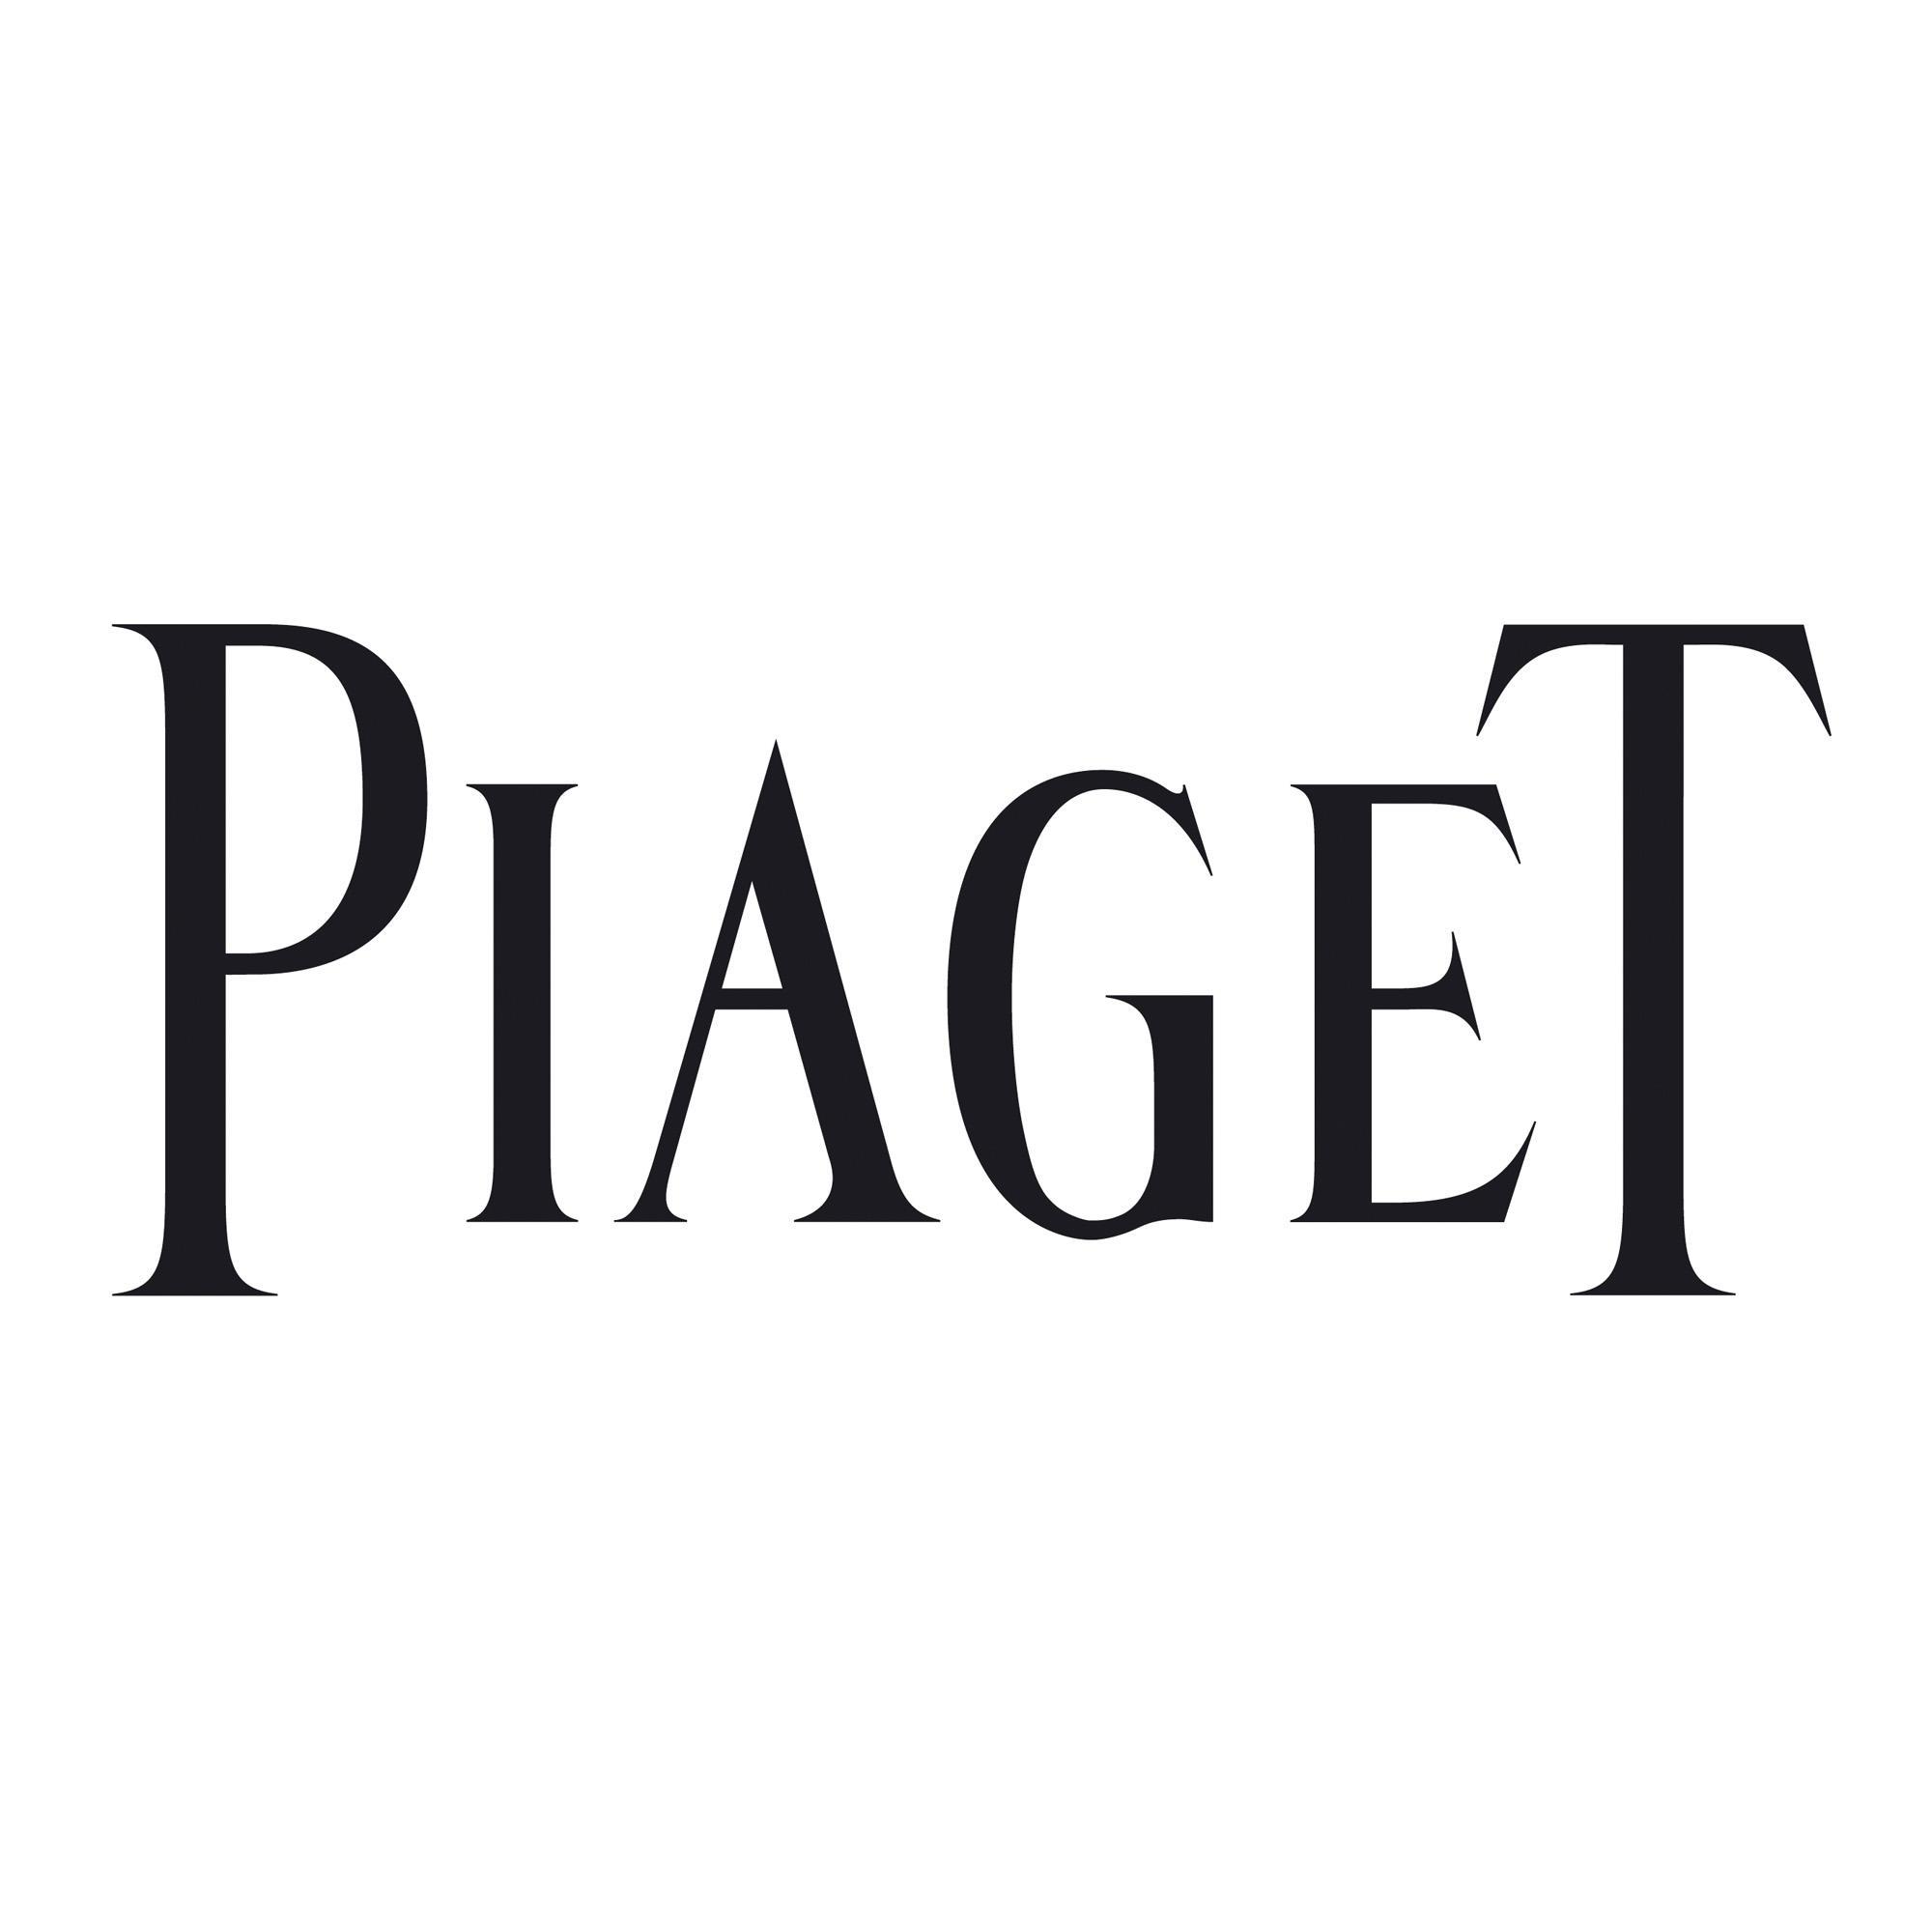 Piaget Boutique Abu Dhabi - The Galleria Al Maryah Island